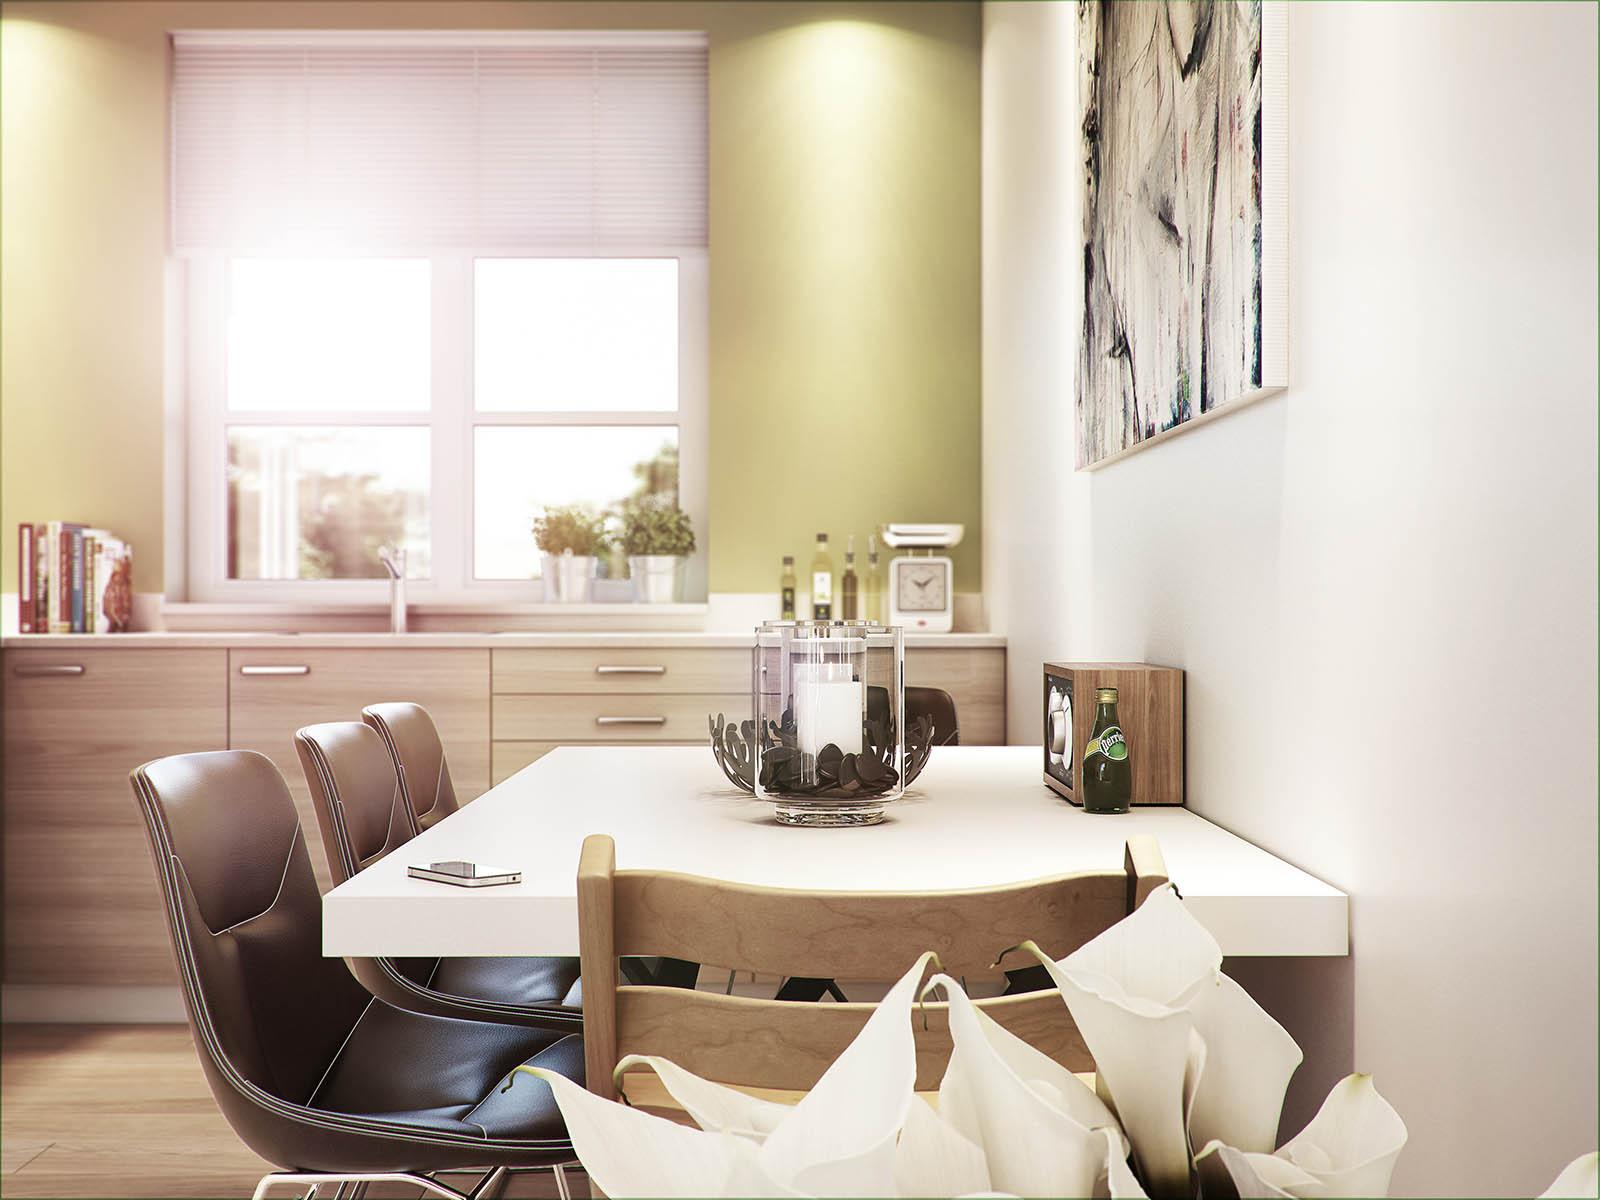 interieur impressie DWanimations keuken